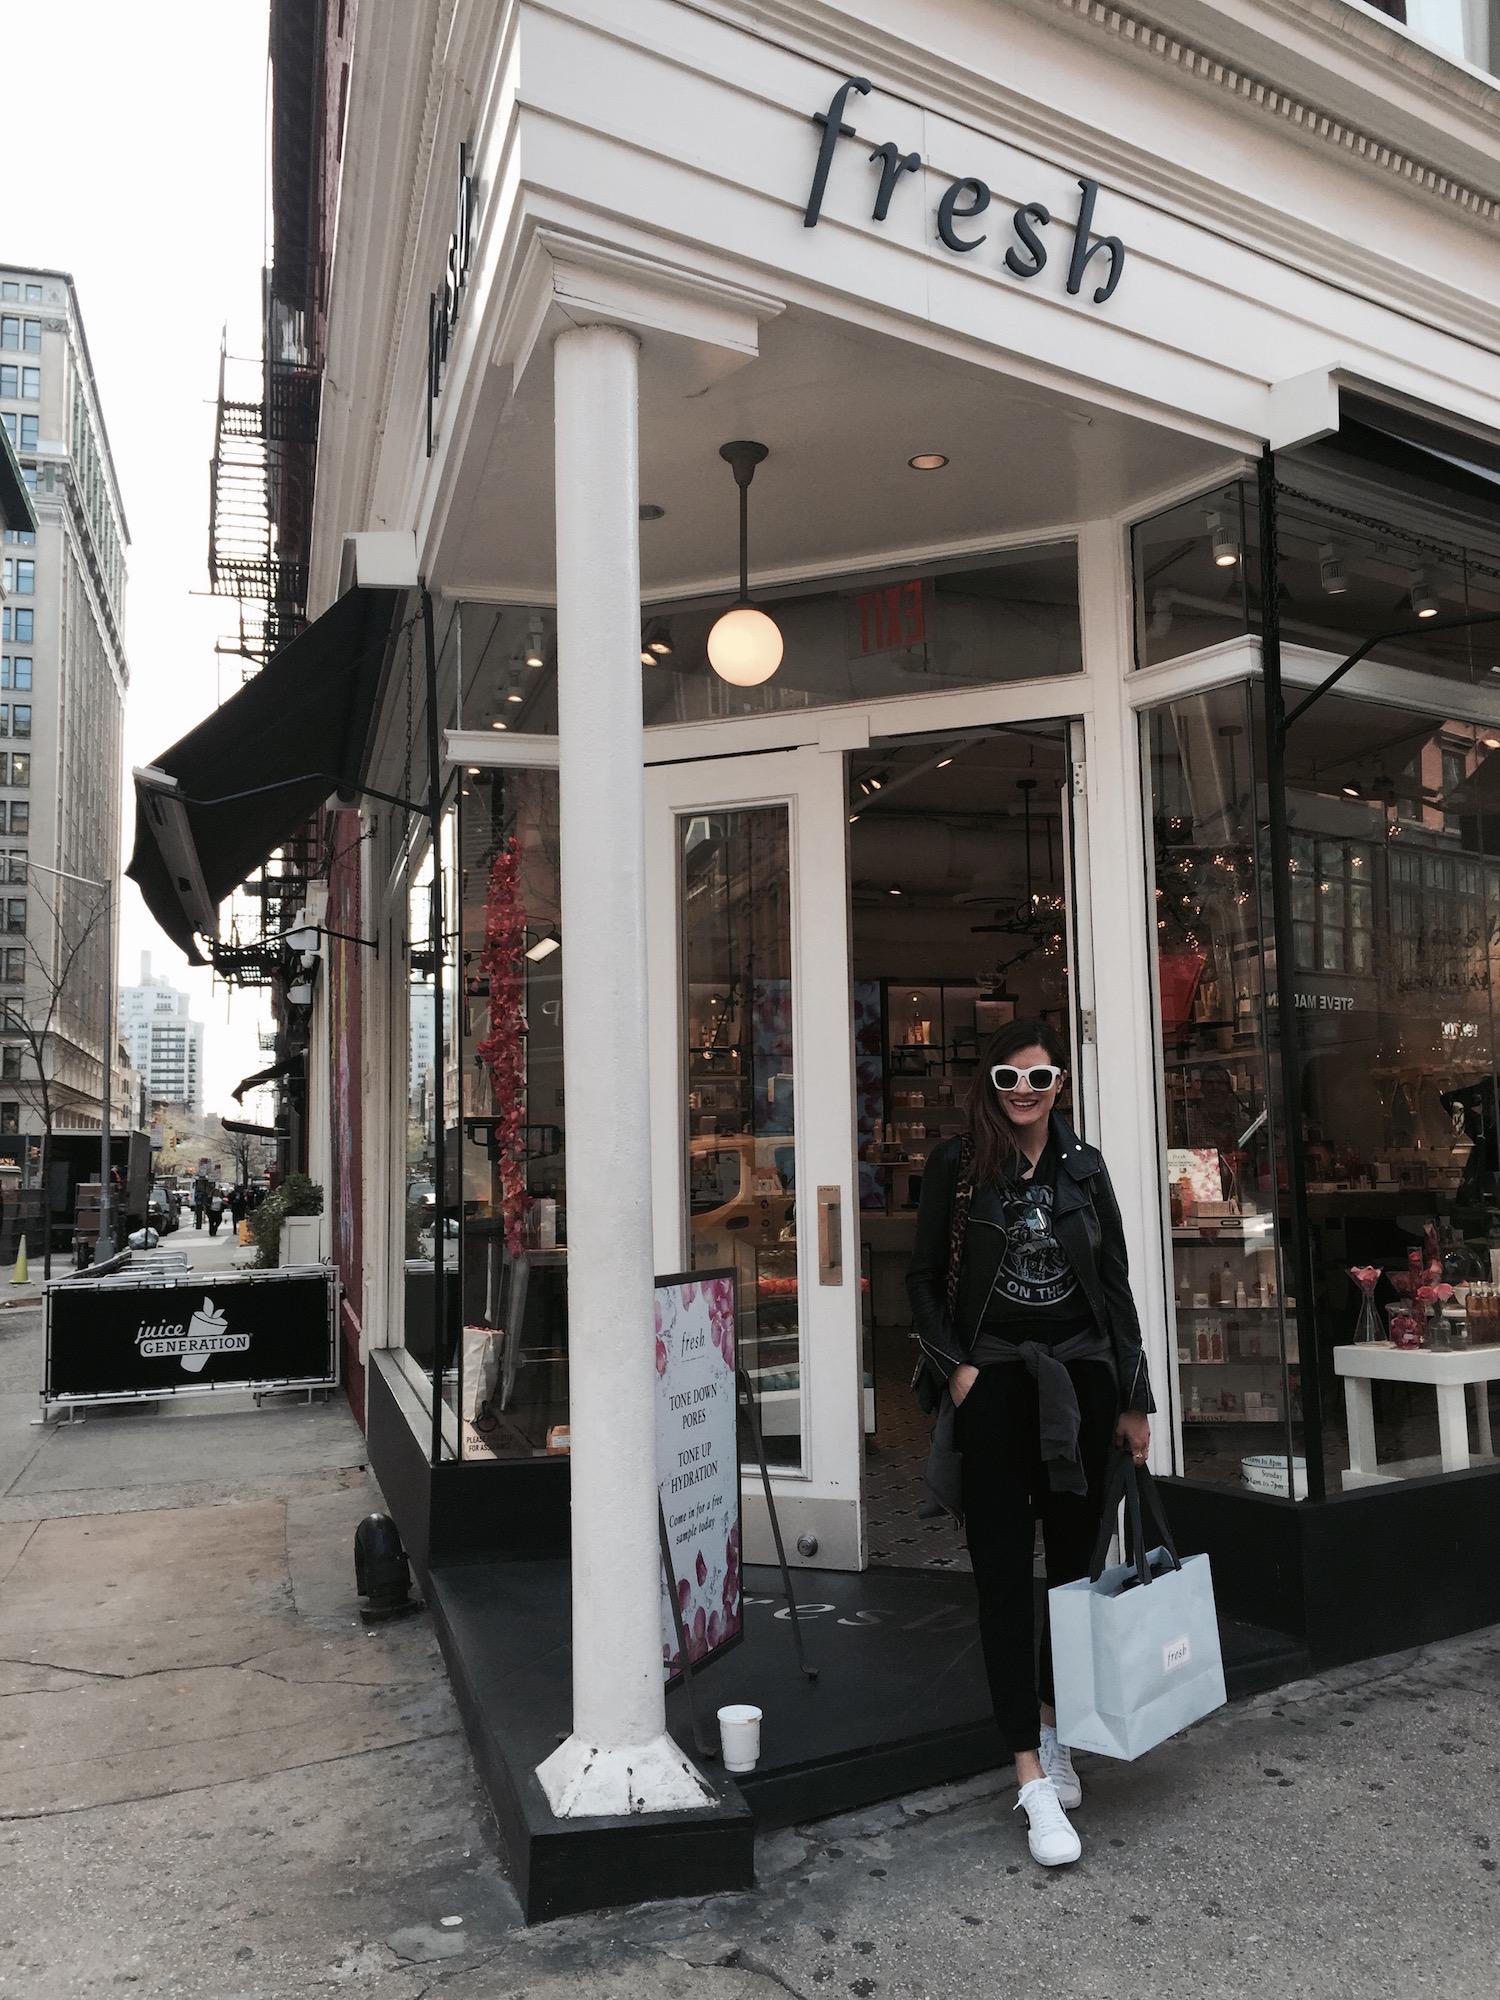 Fresh Store New York, Union Square - NYC Travel Diary - woahstyle.com 27.jpg